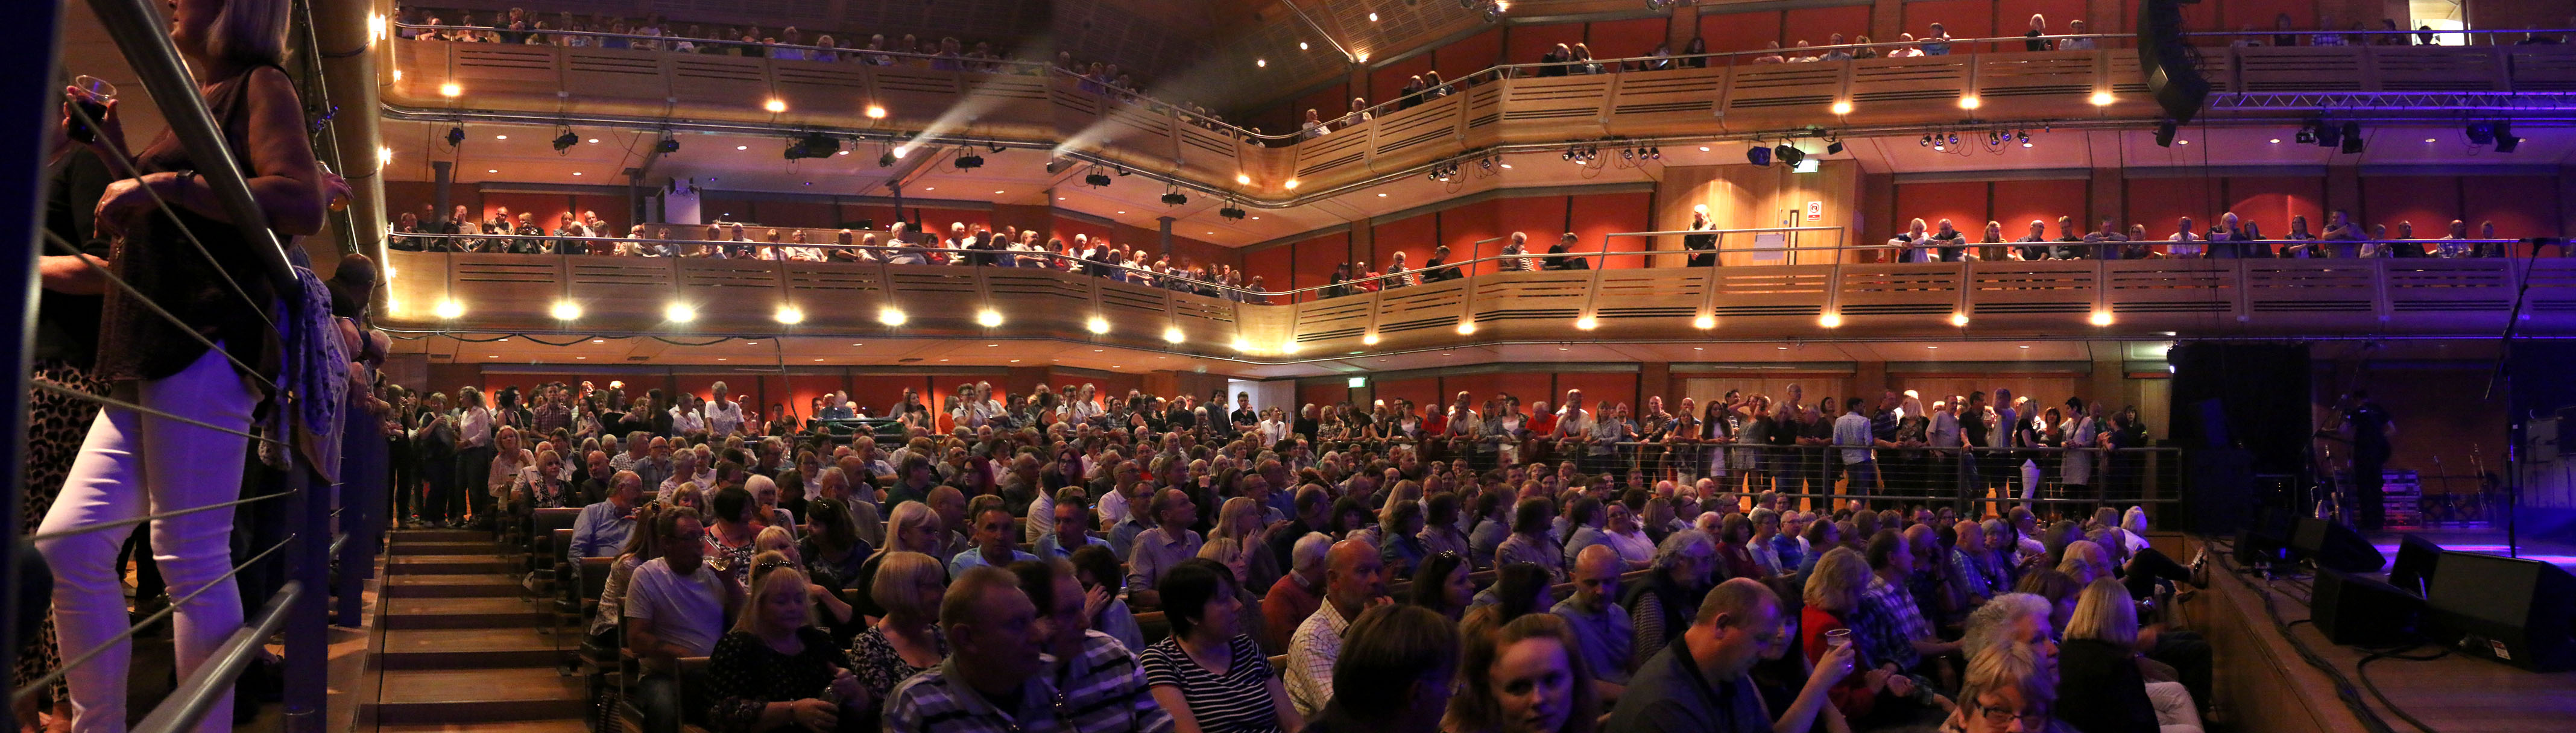 Suffolk Jazz Venue The Apex Bury St Edmunds Jbgb Events